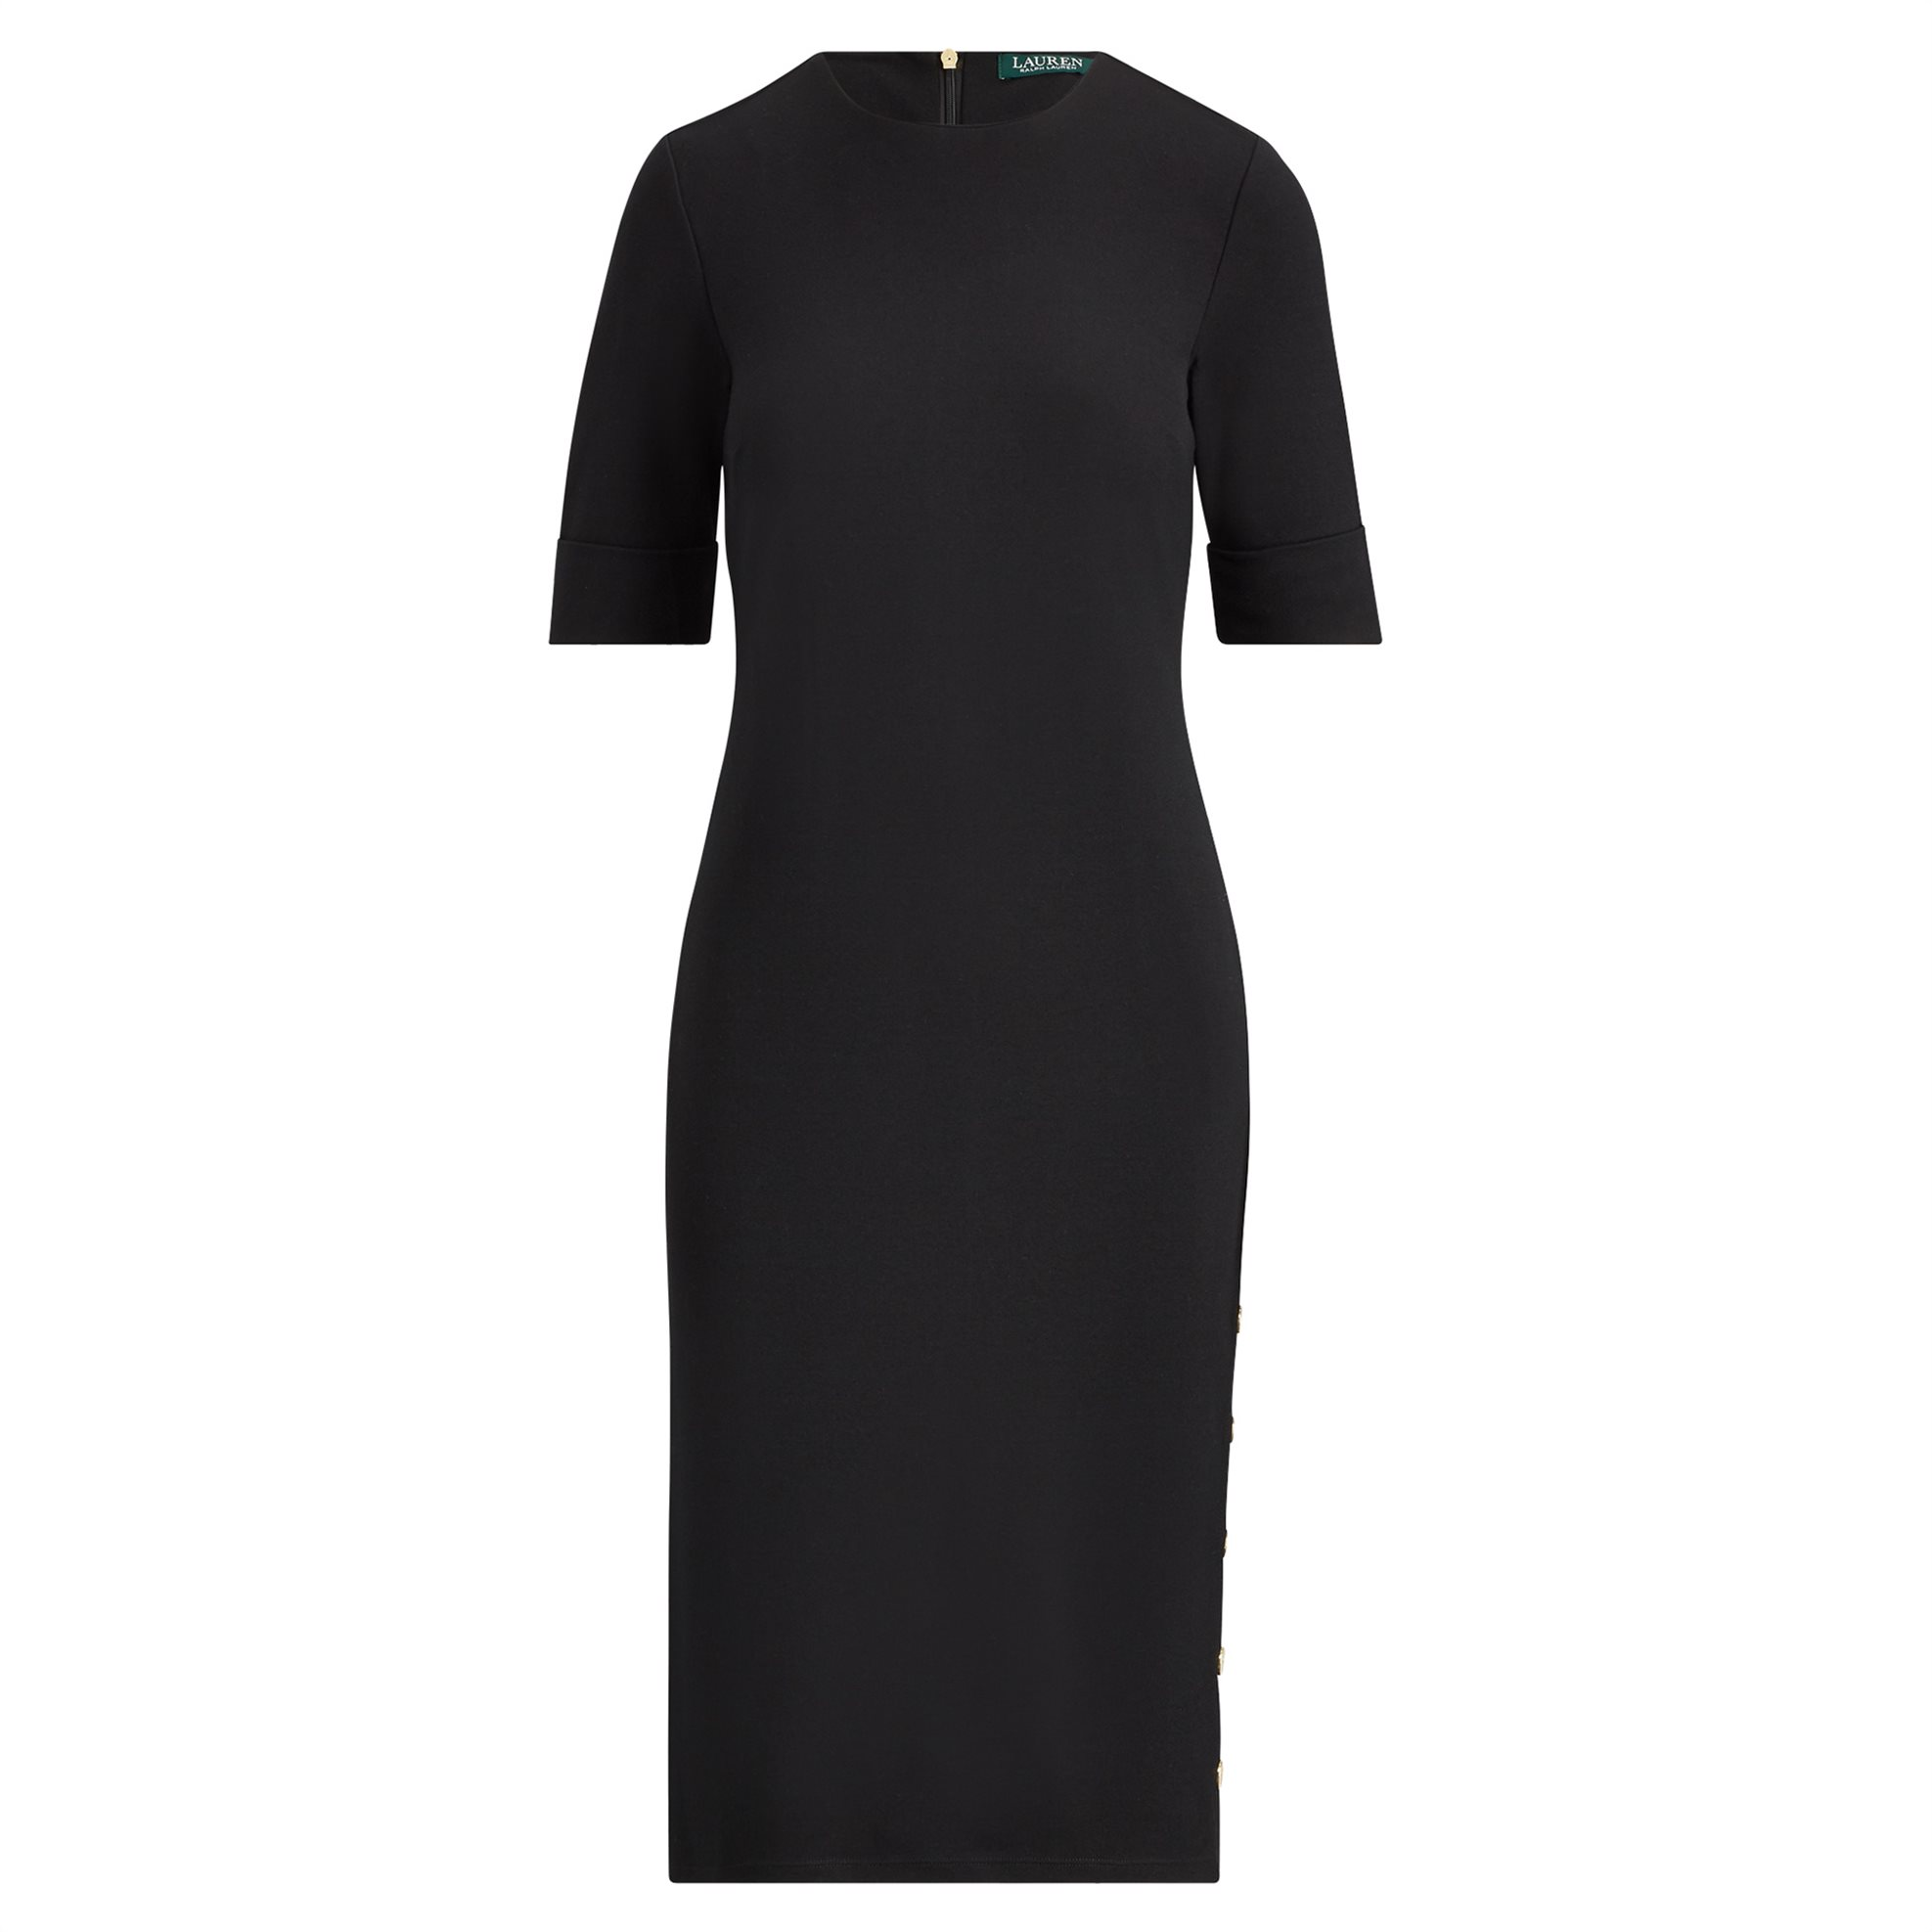 Lauren Ralph Lauren γυναικείο φόρεμα Button-Trim Ponte Dress Polo Black - 200709 γυναικα   ρουχα   φορέματα   midi φορέματα